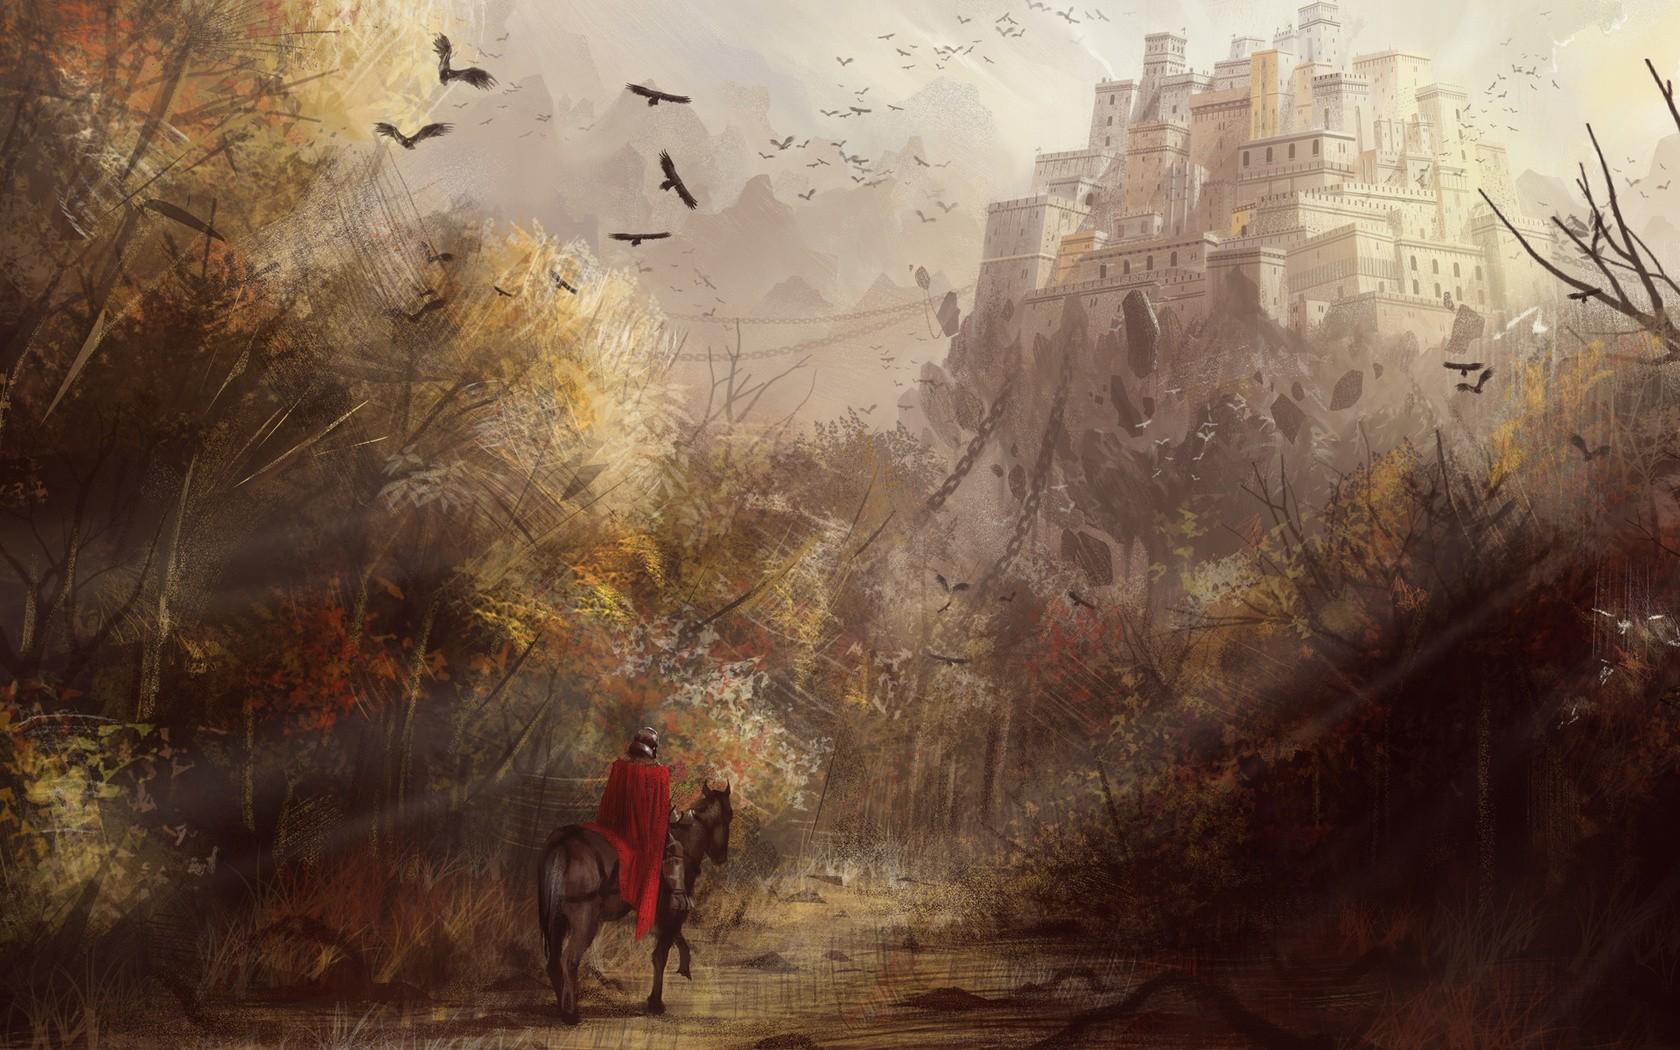 castle drawing knight medieval trees birds wallpaper